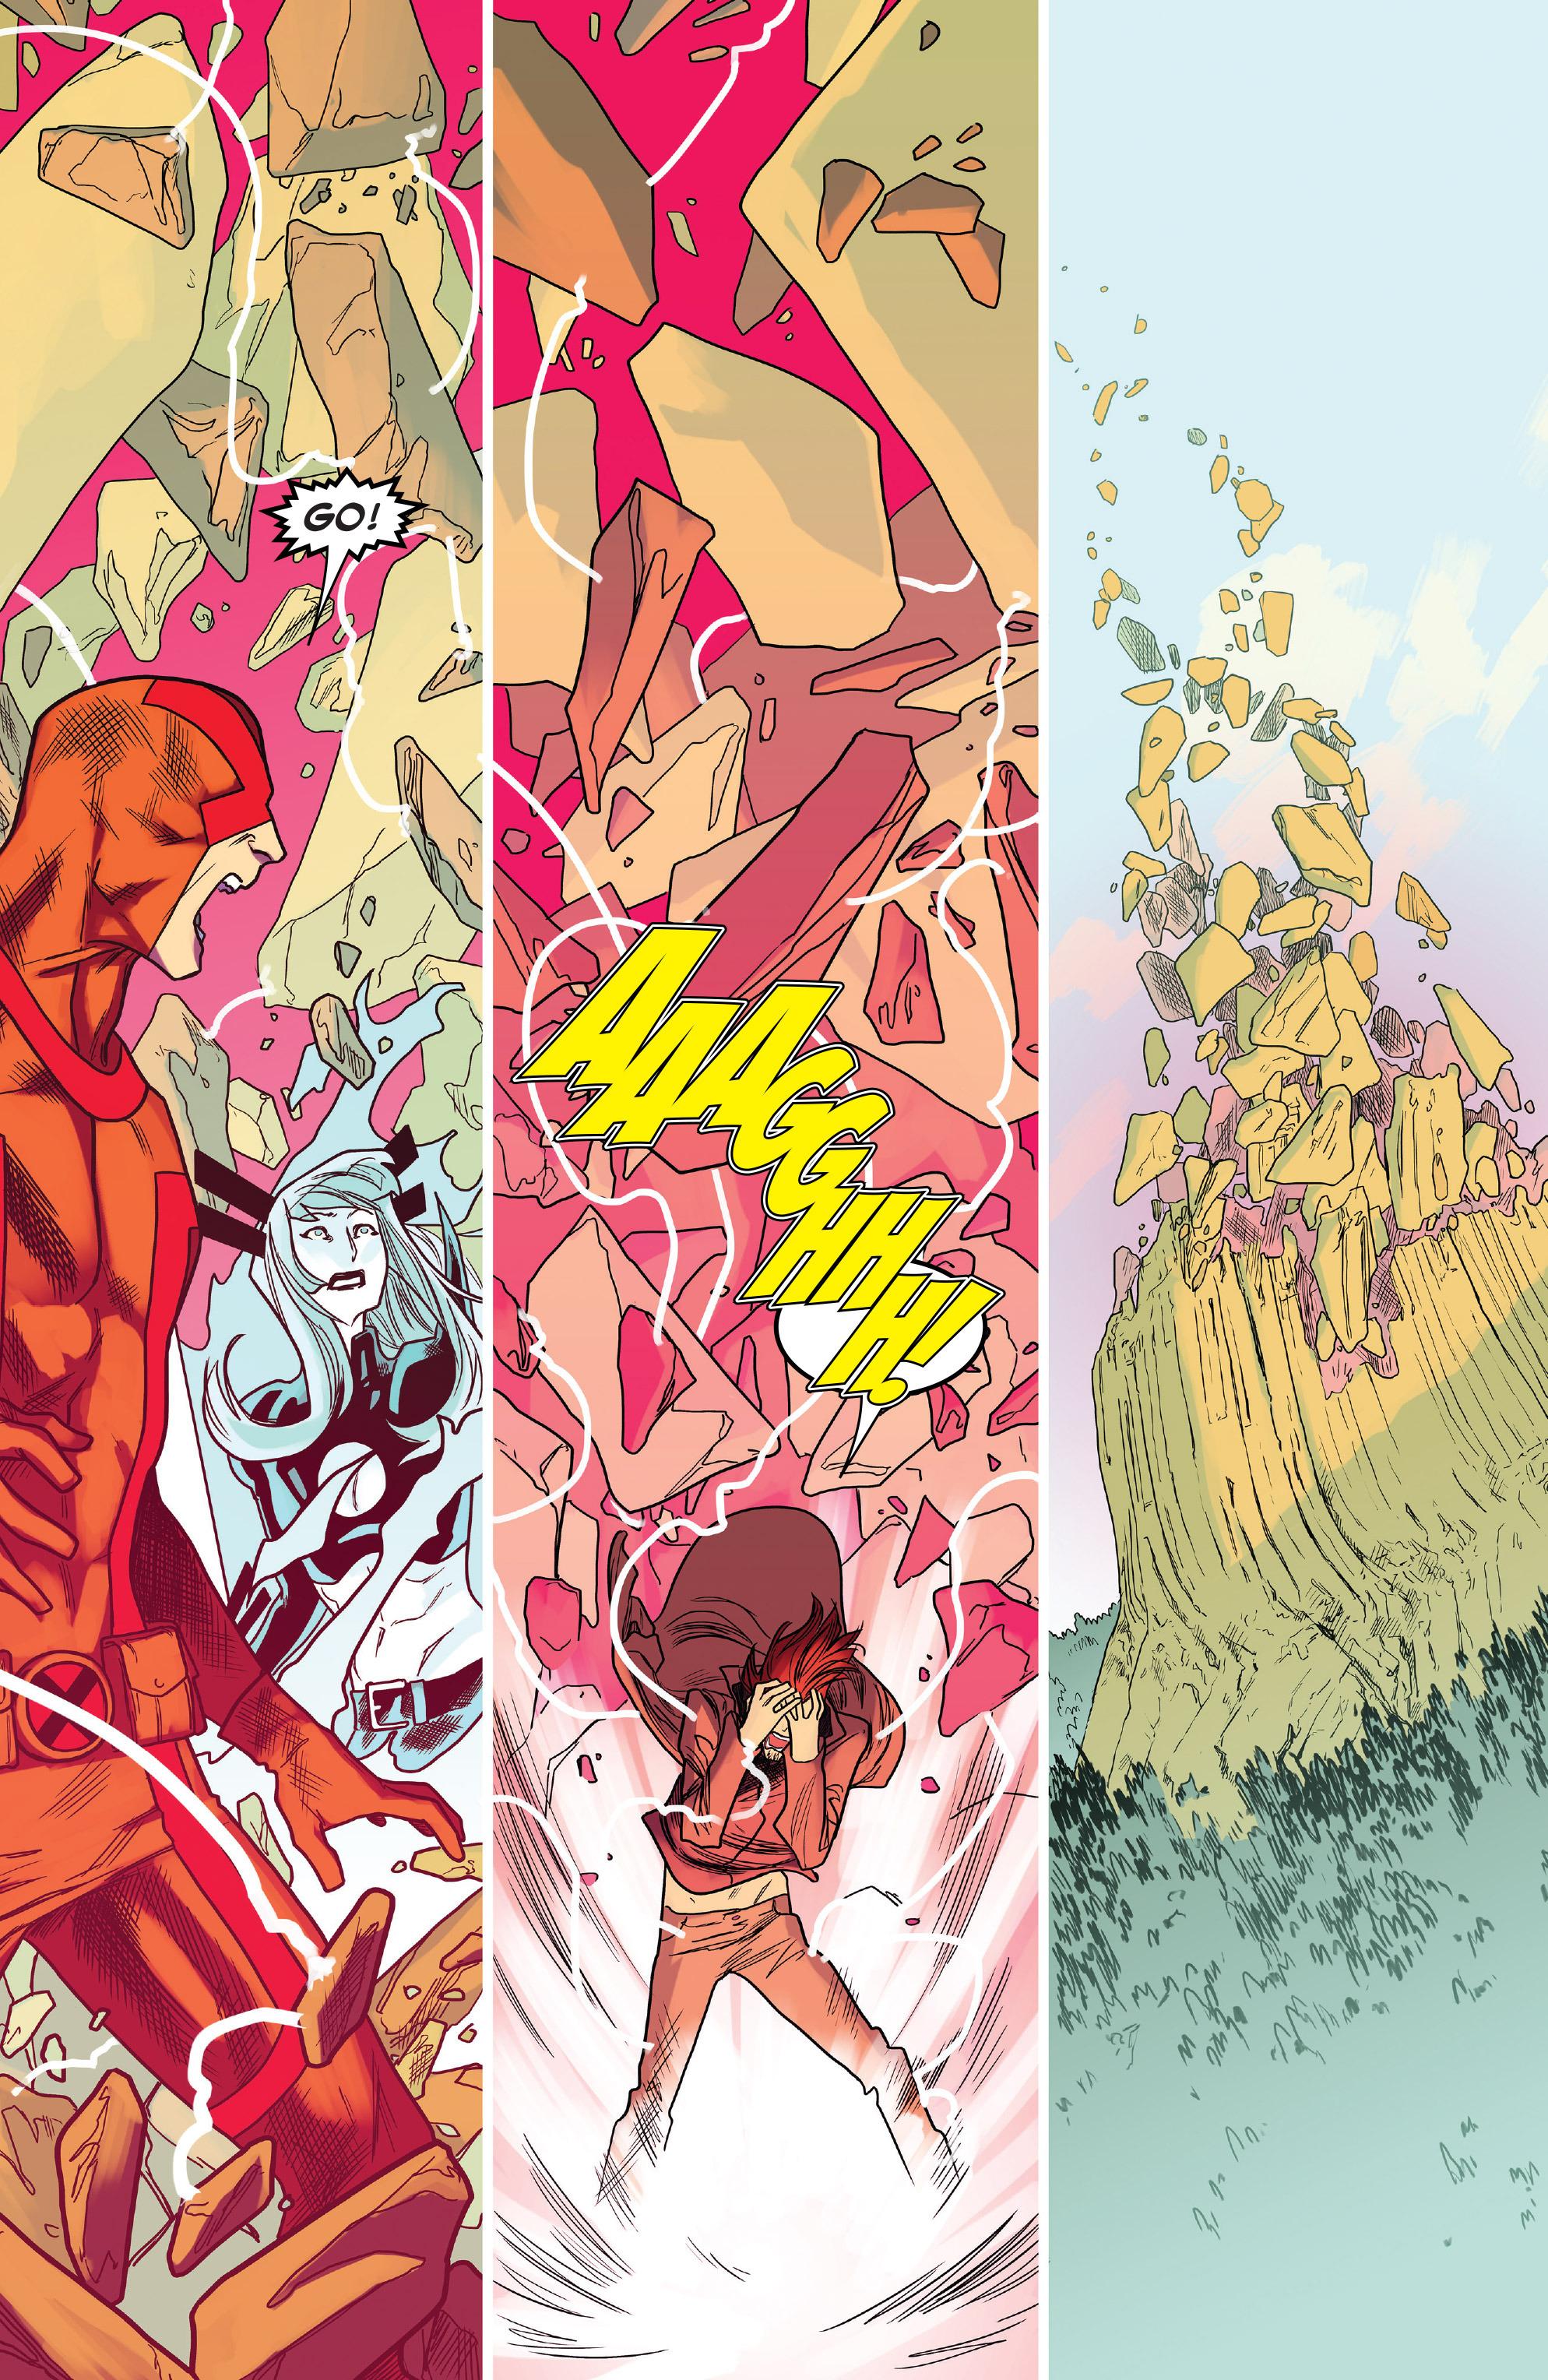 Read online Uncanny X-Men (2013) comic -  Issue # _TPB 5 - The Omega Mutant - 52